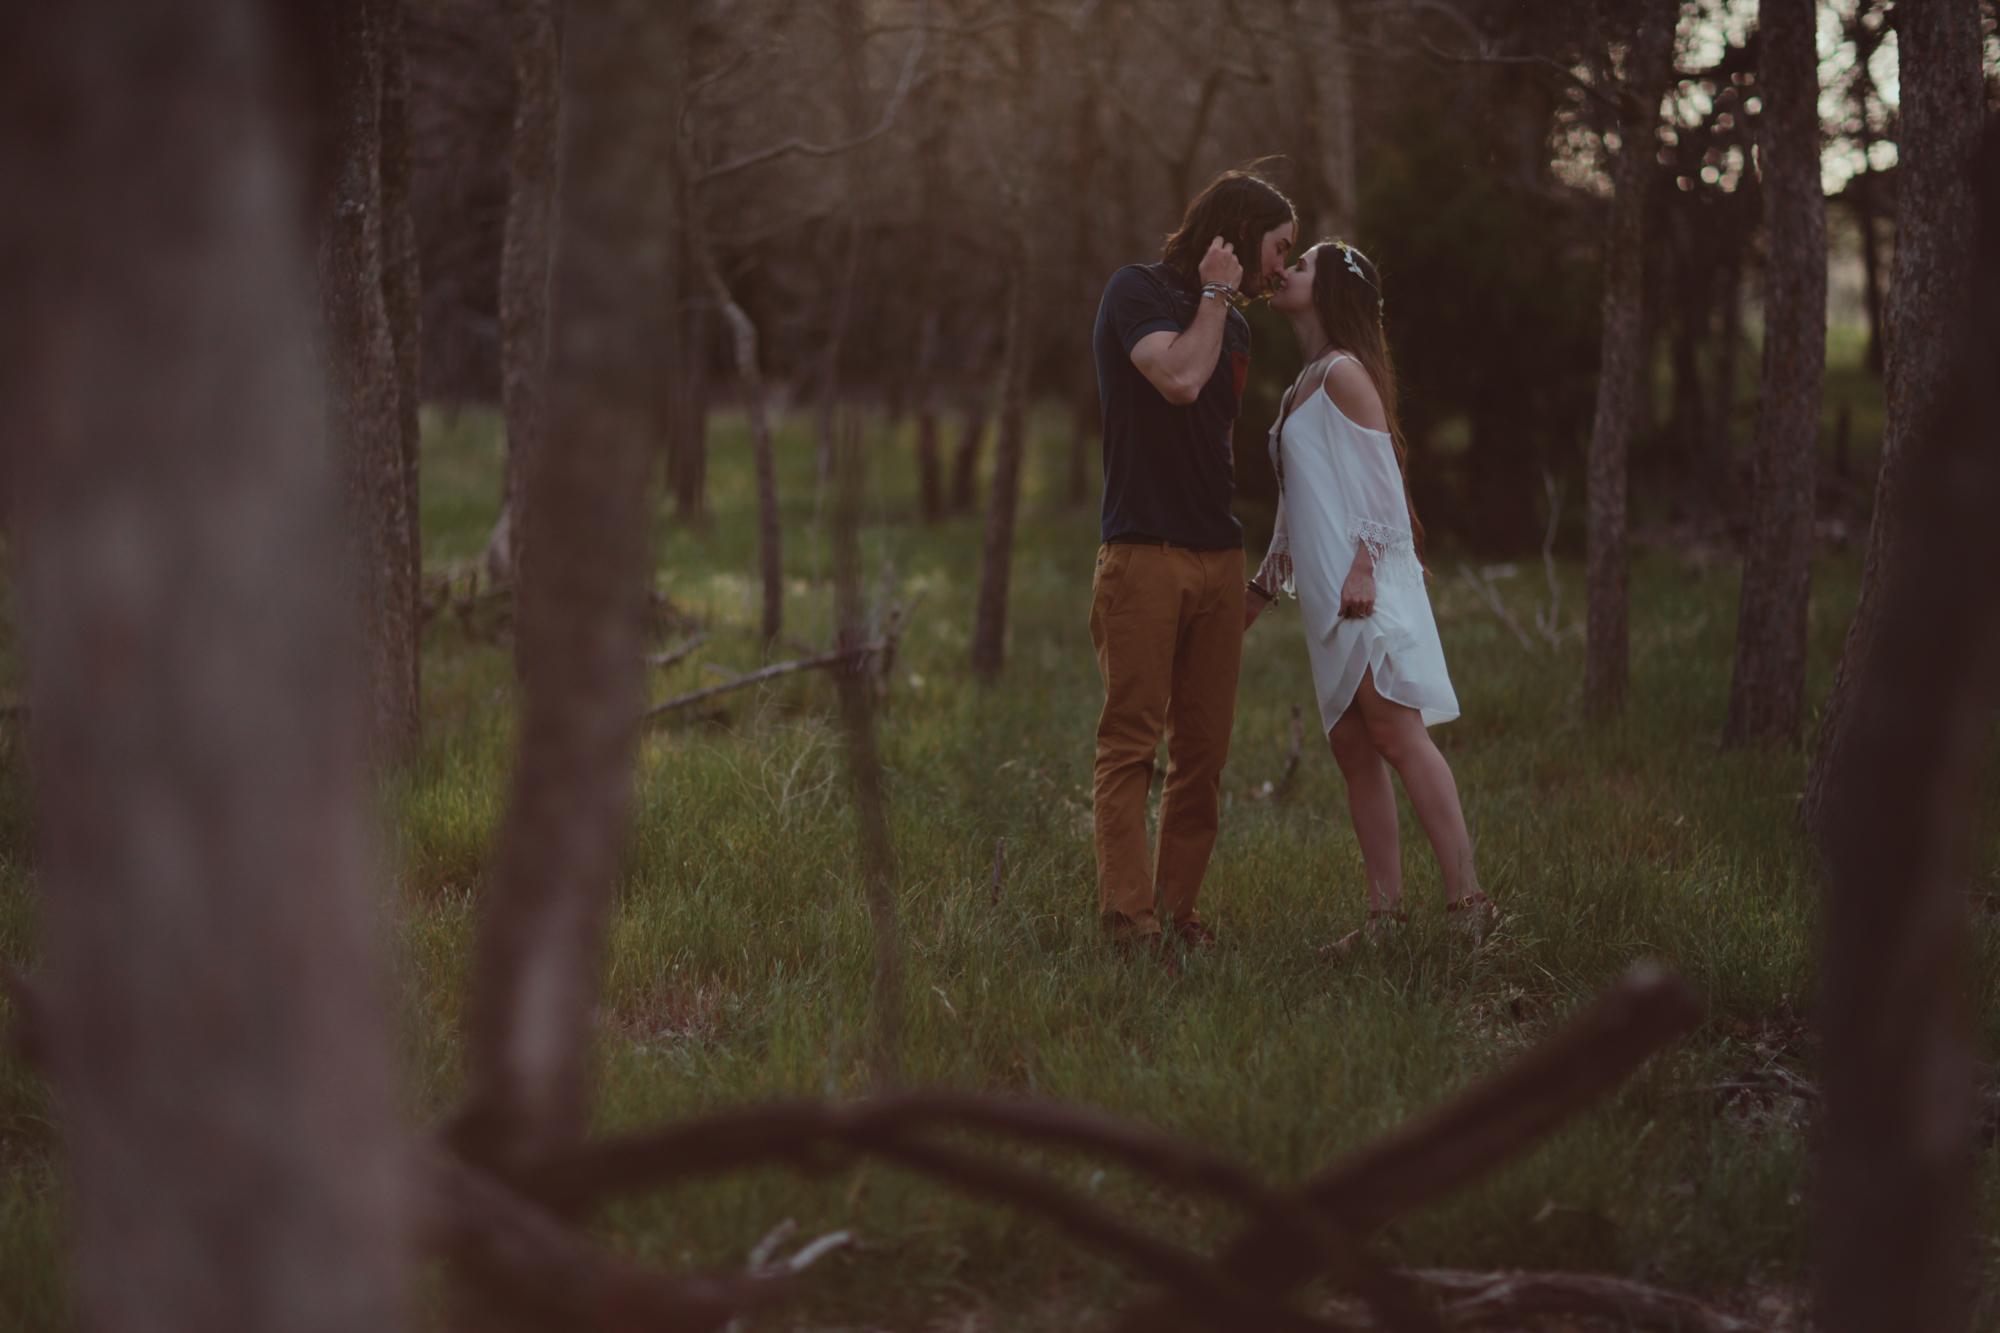 Photo by jFairchild Photography